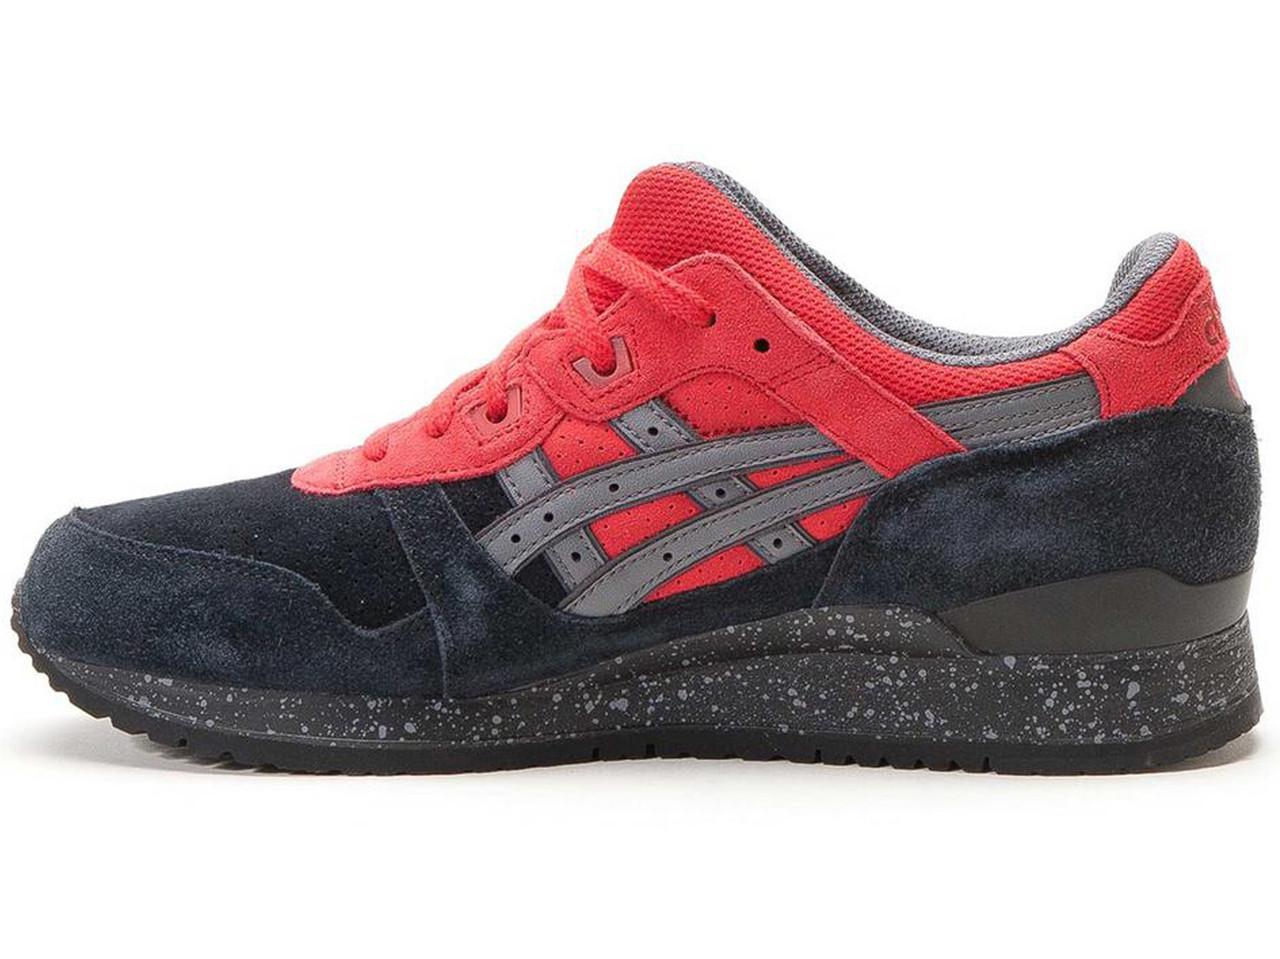 572931c79b5e Мужские кроссовки Asics Gel Lyte III Bad Santa Christmas Pack Black Red  (Реплика ААА